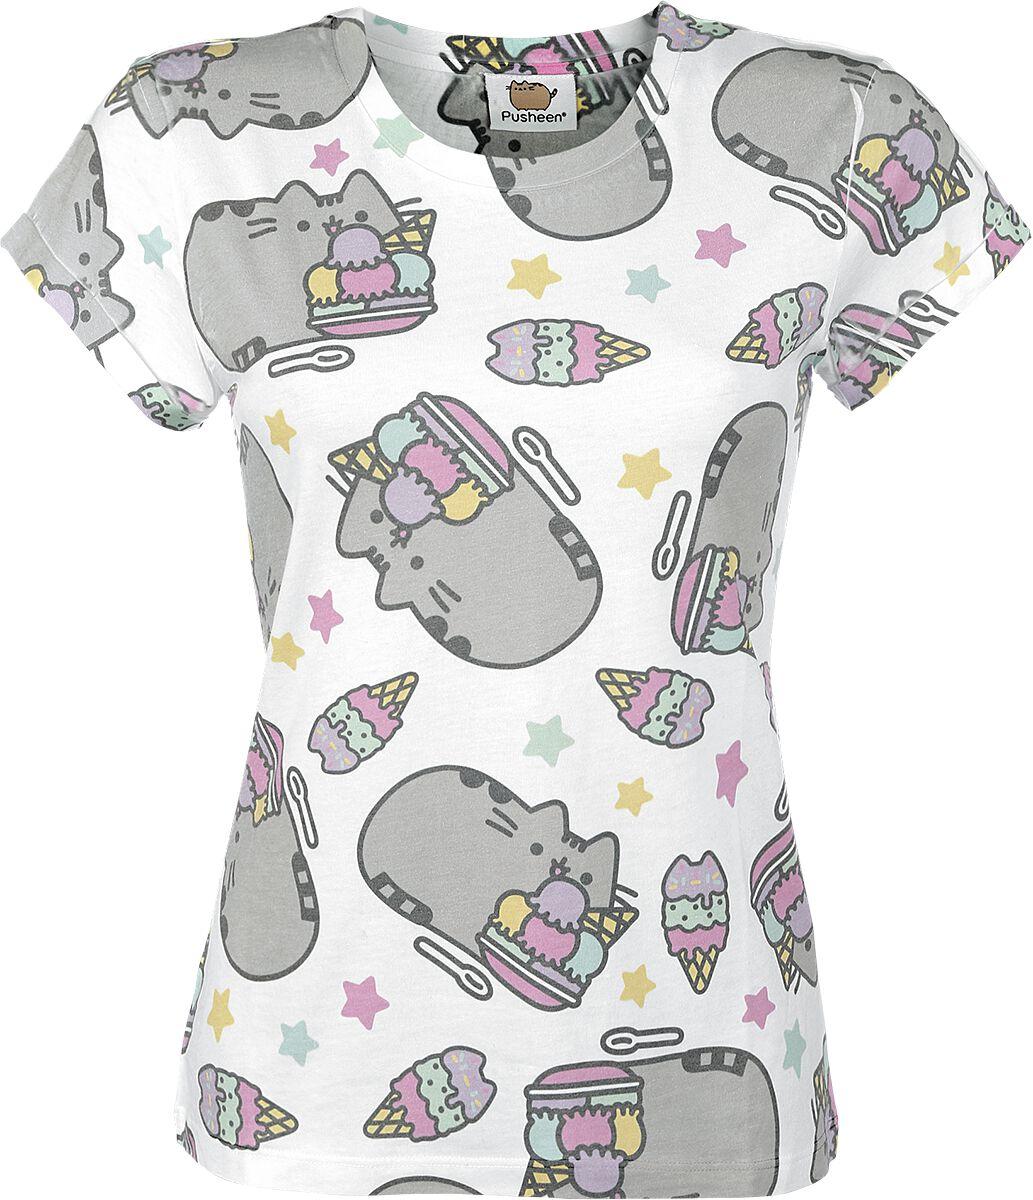 Merch dla Fanów - Koszulki - Koszulka damska Pusheen Ice Cream Koszulka damska biały - 332457